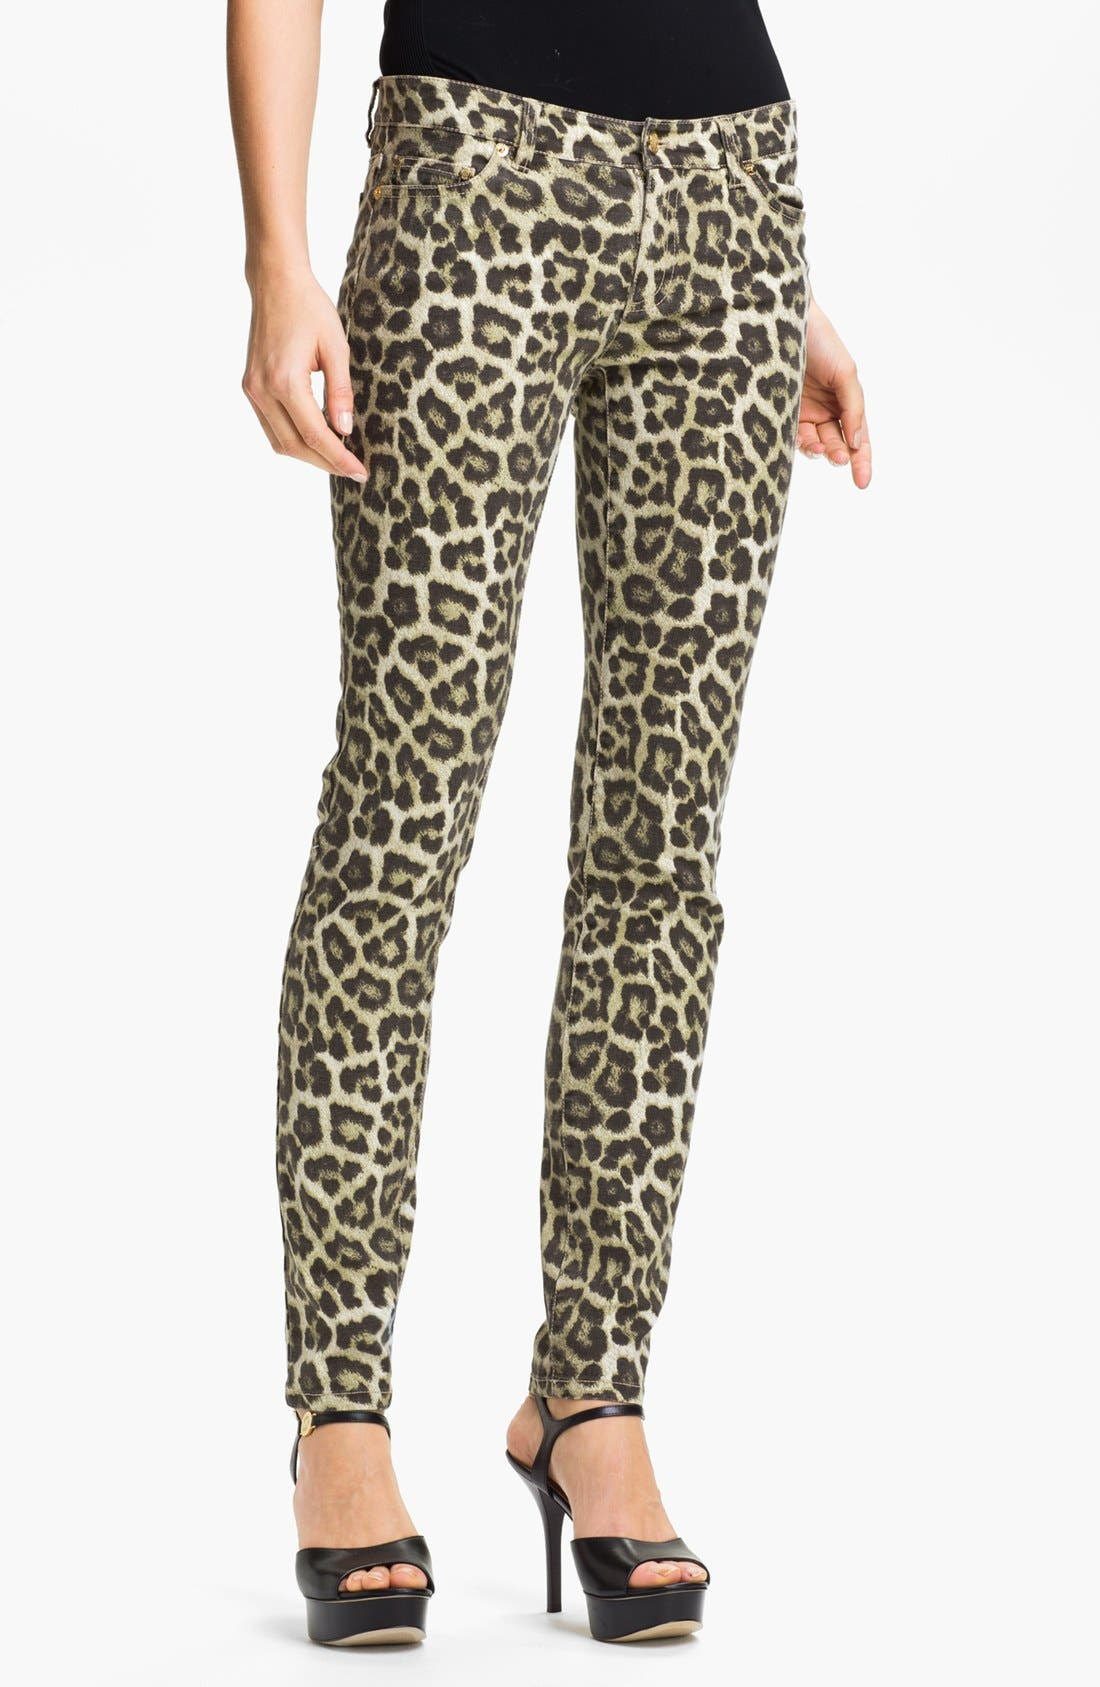 Main Image - MICHAEL Michael Kors 'Savannah' Leopard Print Skinny Jeans (Petite)